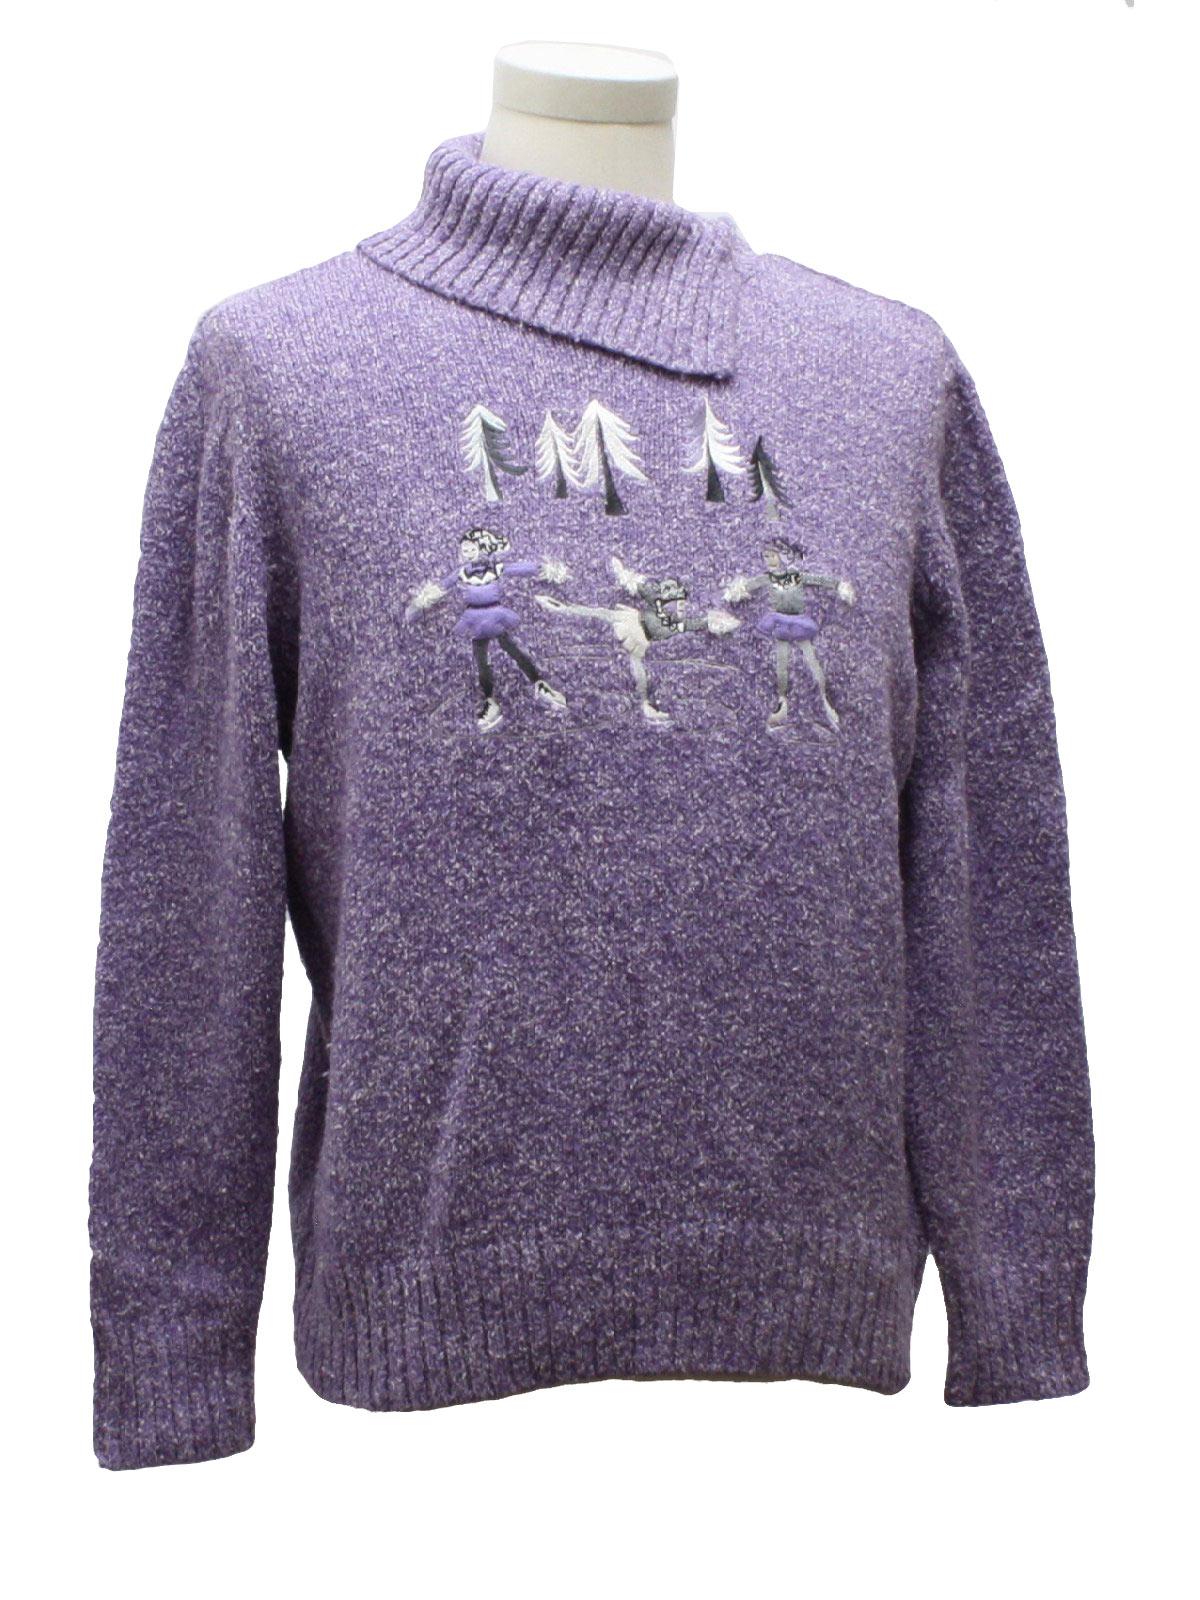 Womens Ugly Christmas Sweater: -TanJay- Womens purple background ...